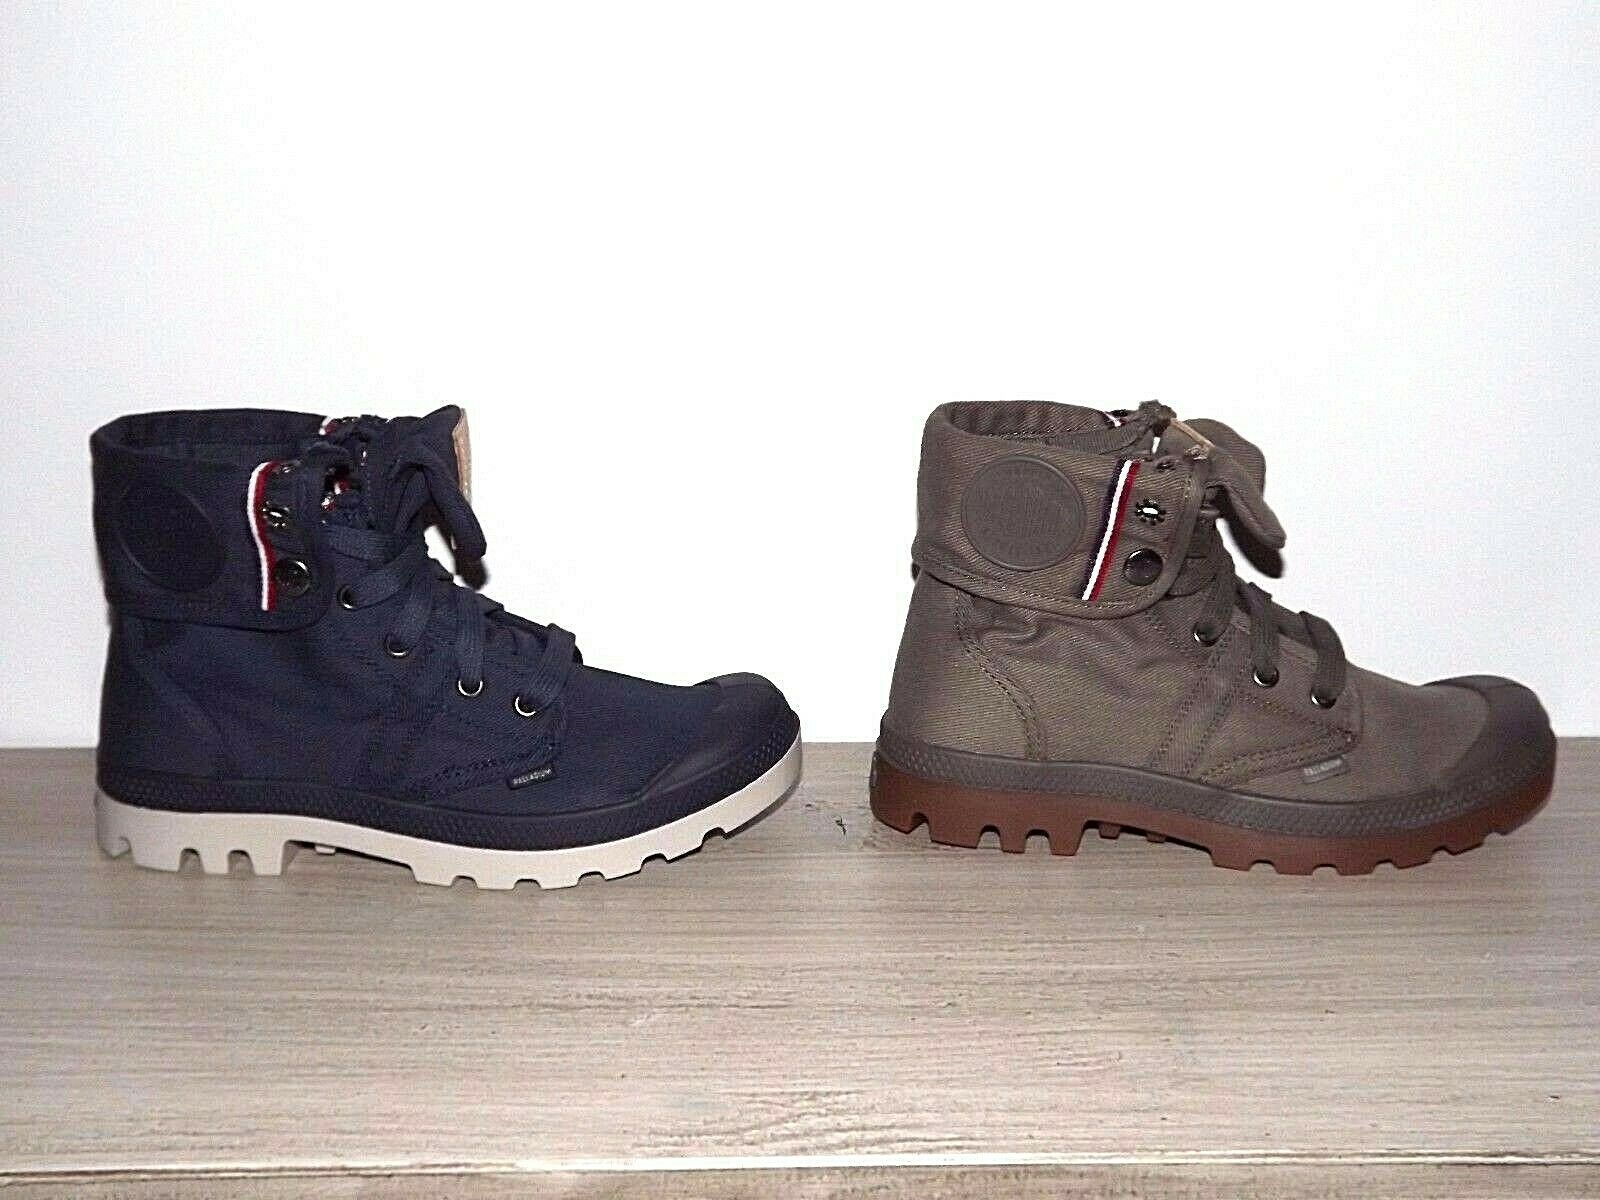 SCONTO 20% PALLADIUM botas UNISEX 37 38 39 40 41 42 43 44 45 zapatos zapatillas